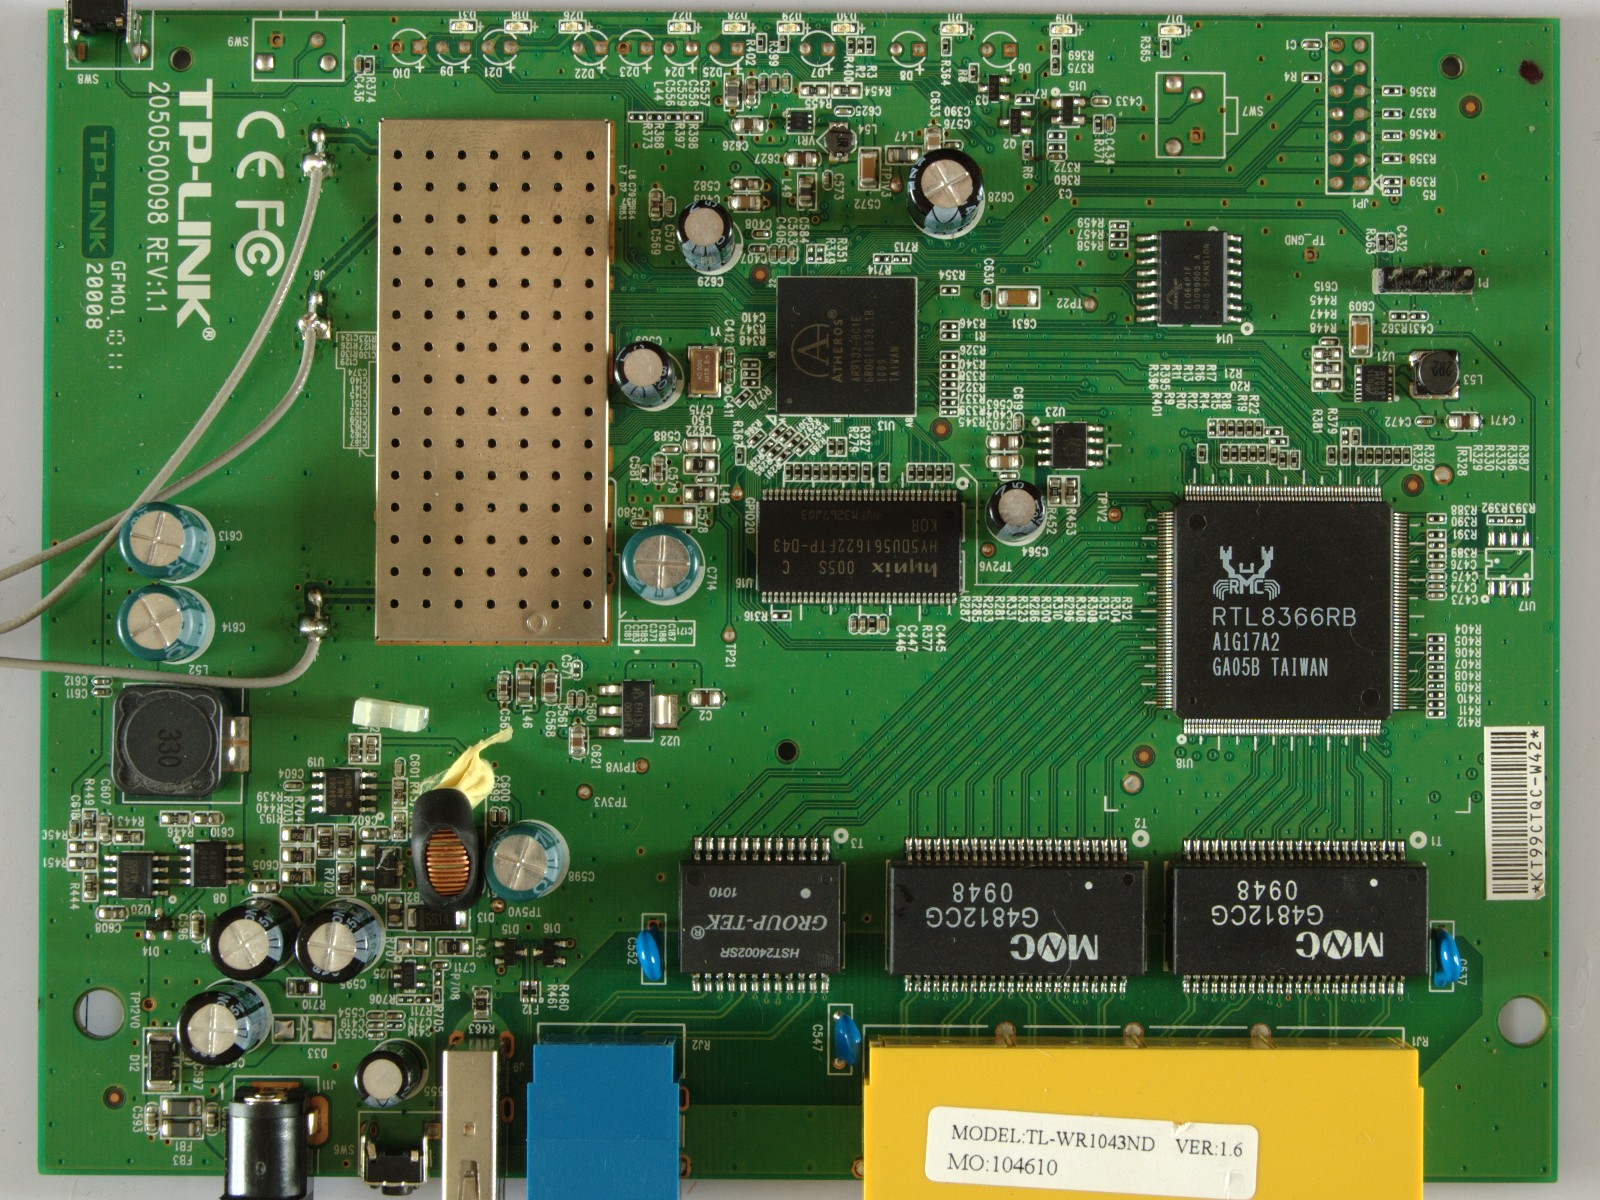 Huawei Hg520i firmware upgrade